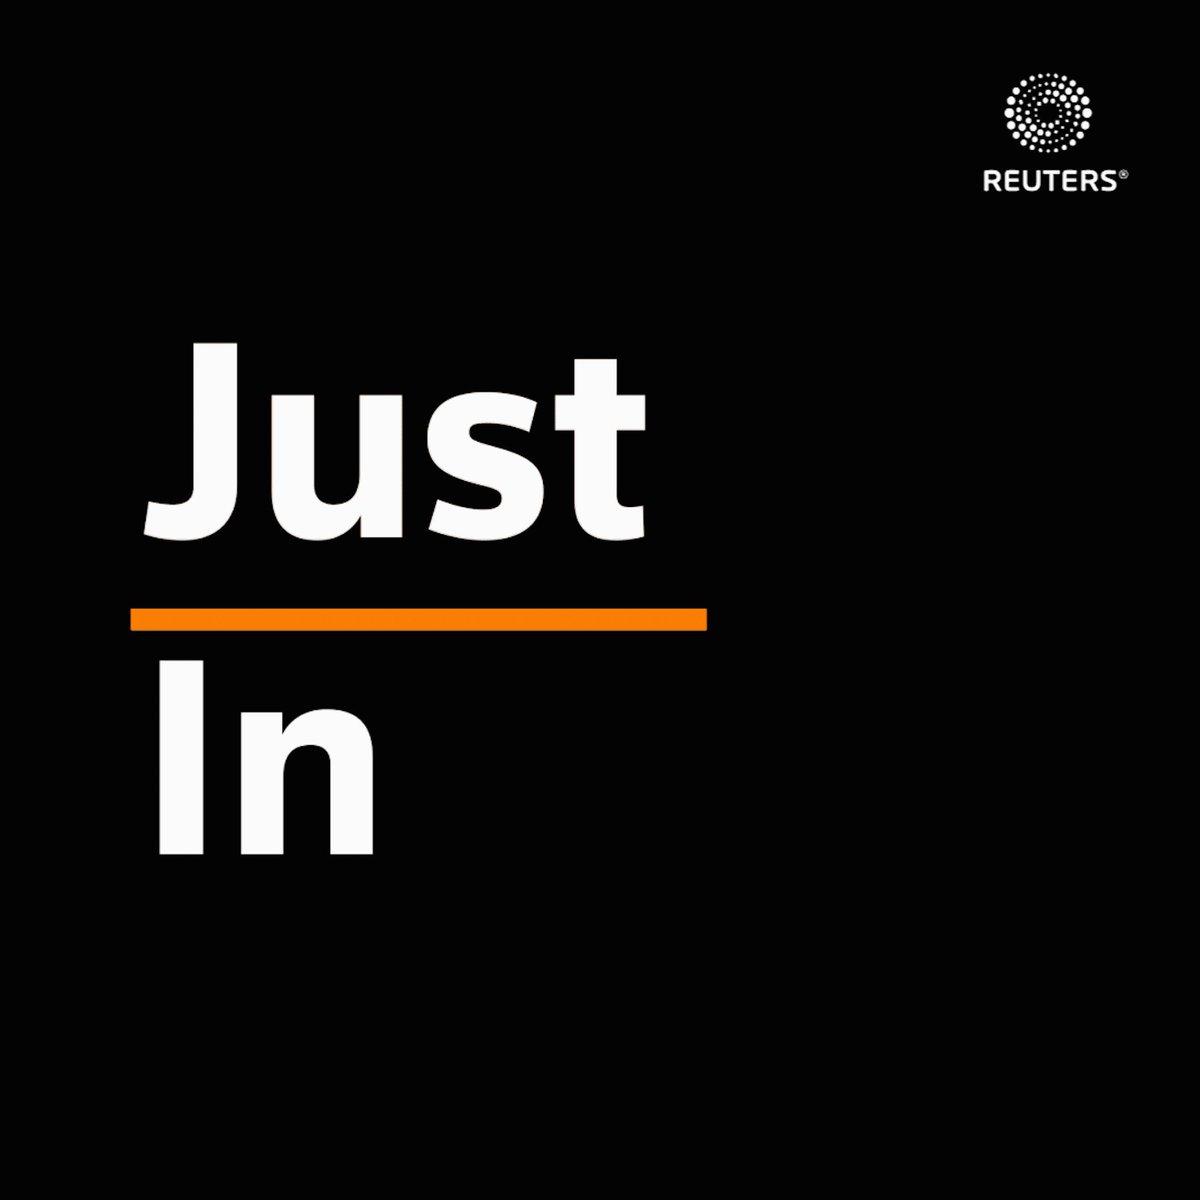 House of Representatives sets Friday vote on $2 trillion coronavirus relief bill. Live updates: https://reut.rs/2x3eOs2